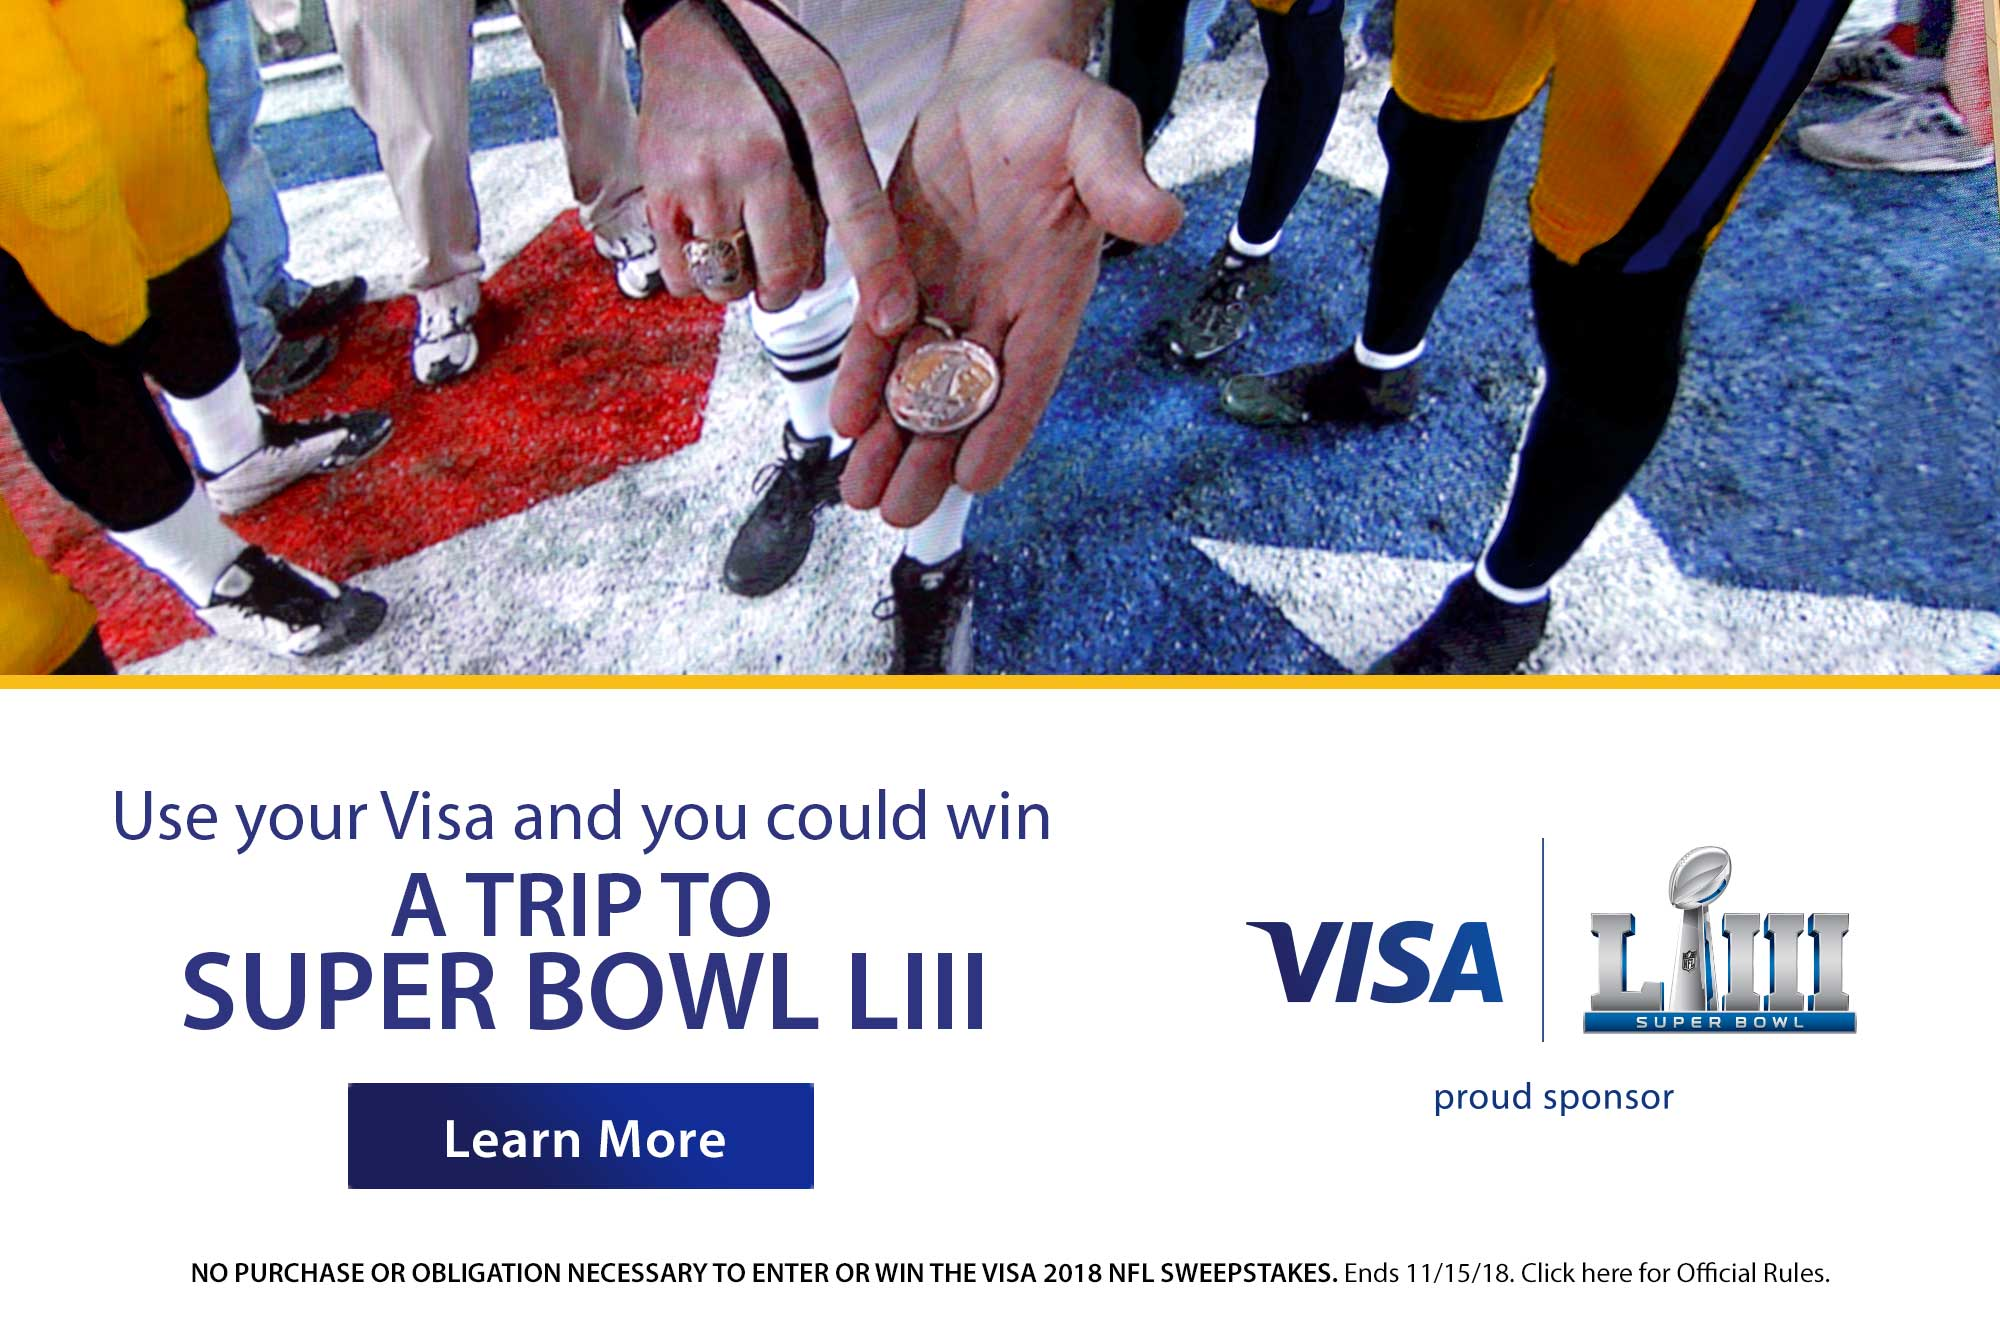 Win a trip to Super Bowl 53